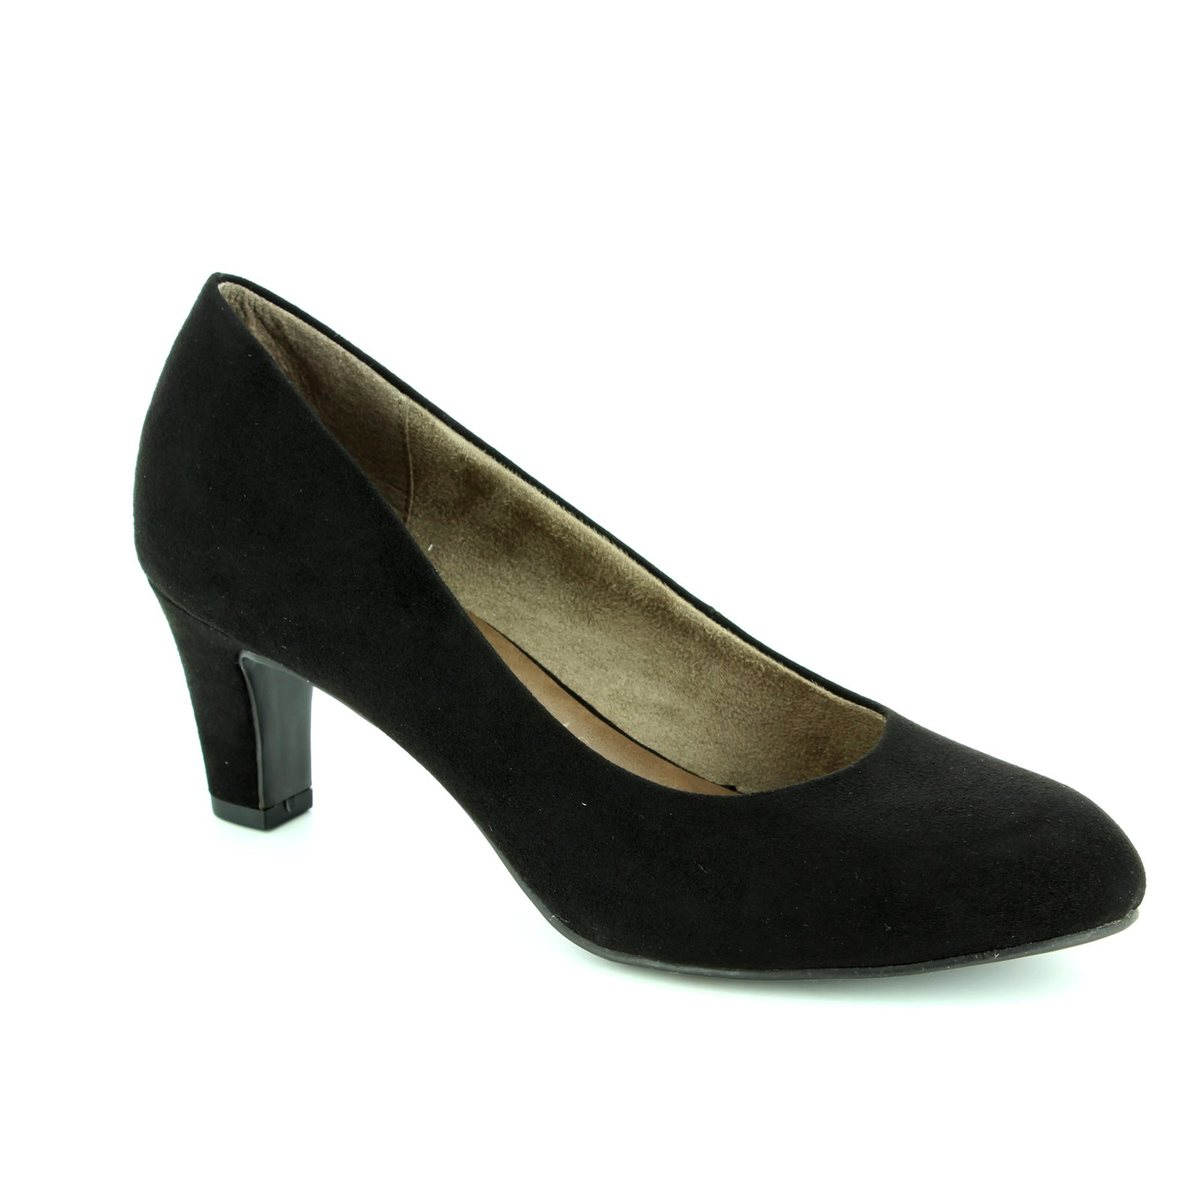 becded424e8 Tamaris High-heeled Shoes - Black - 22418 001 CAXIAS